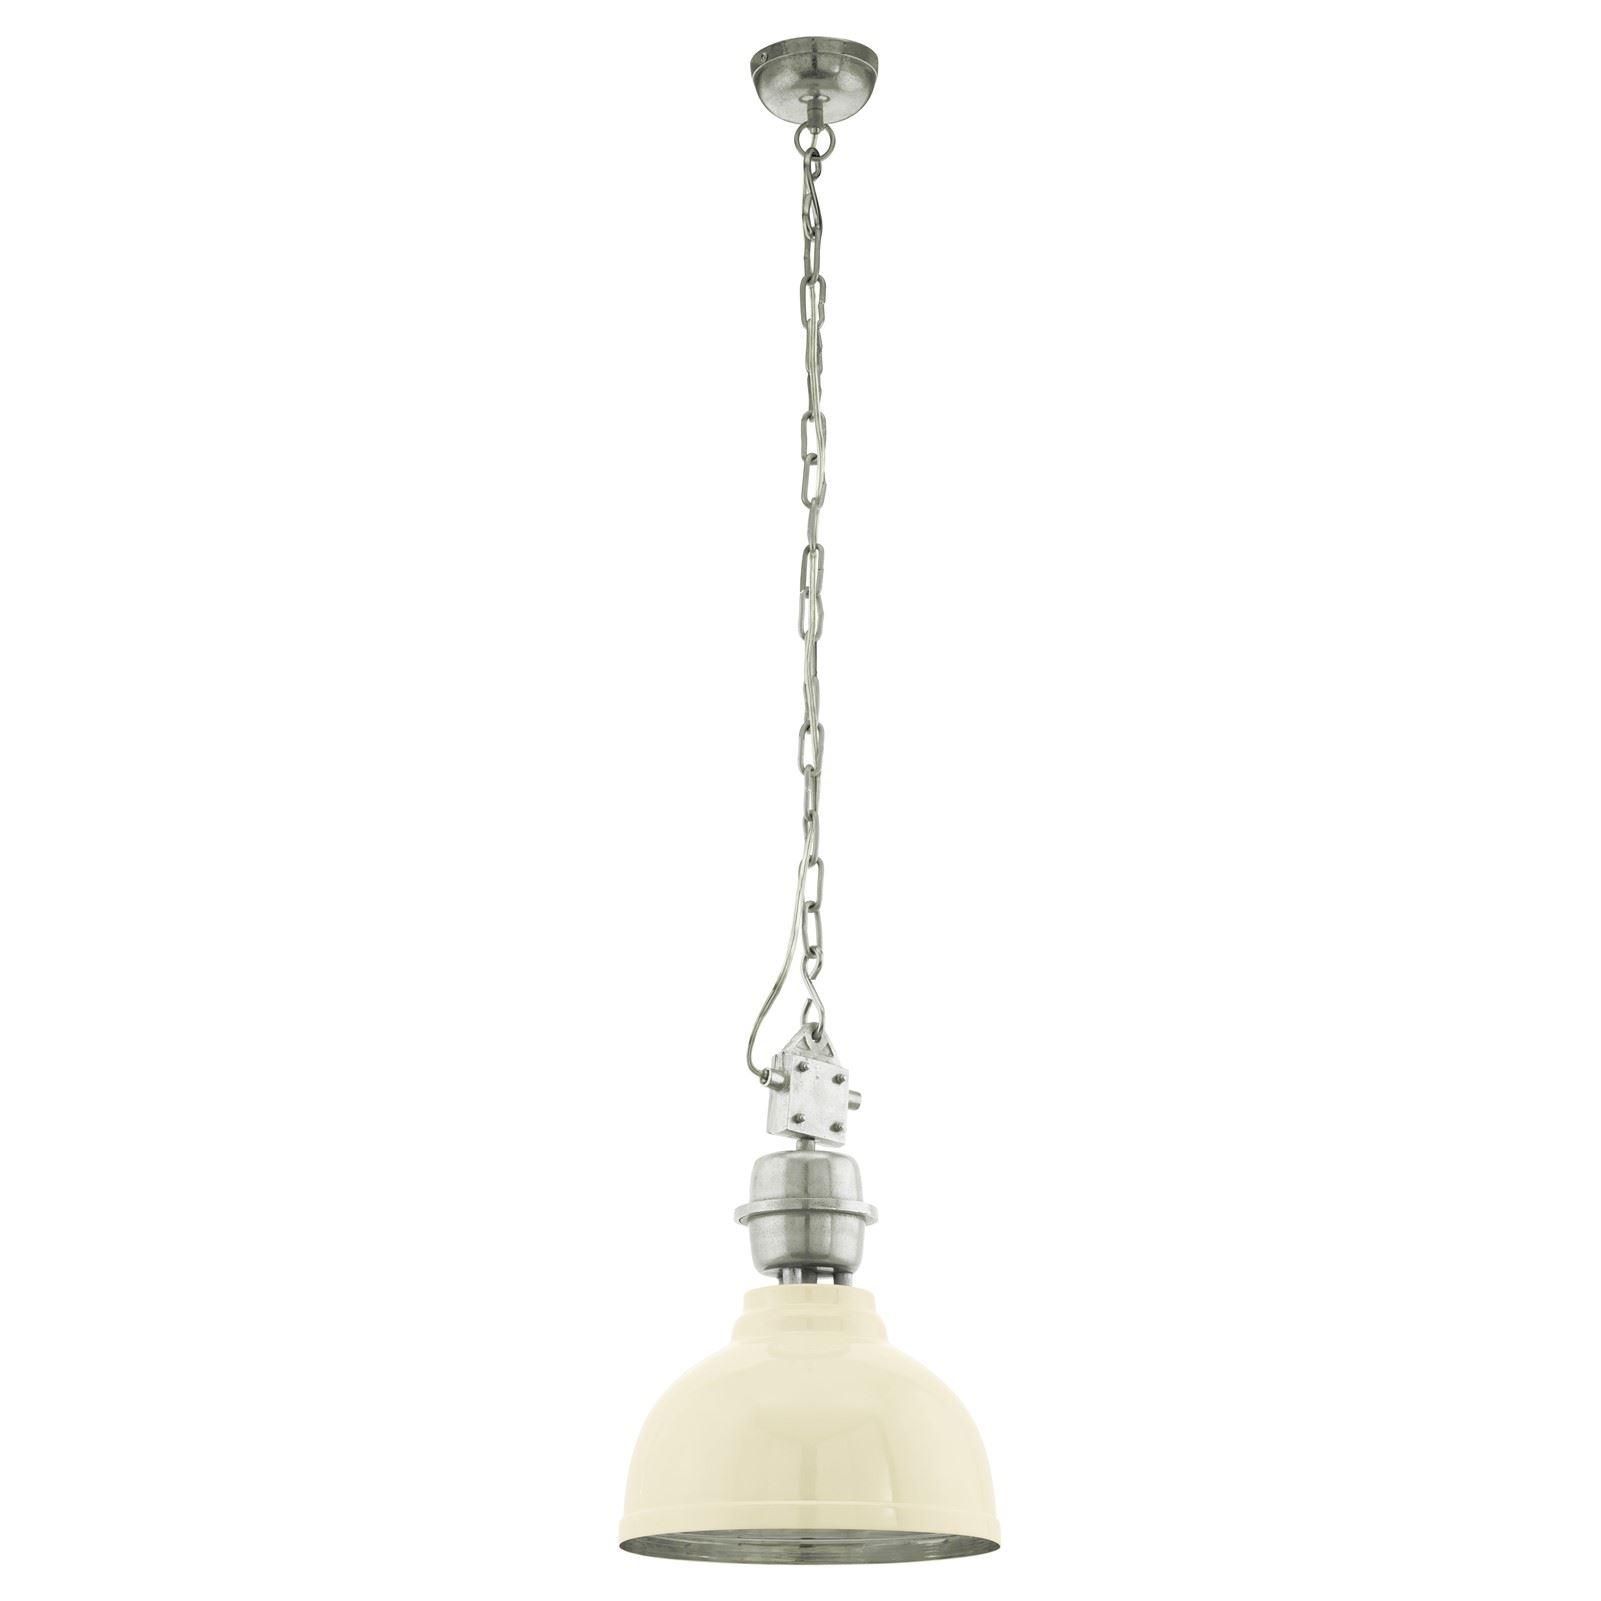 Grantham Steel 1 Hanging Light E27 Cream Beige Chrome